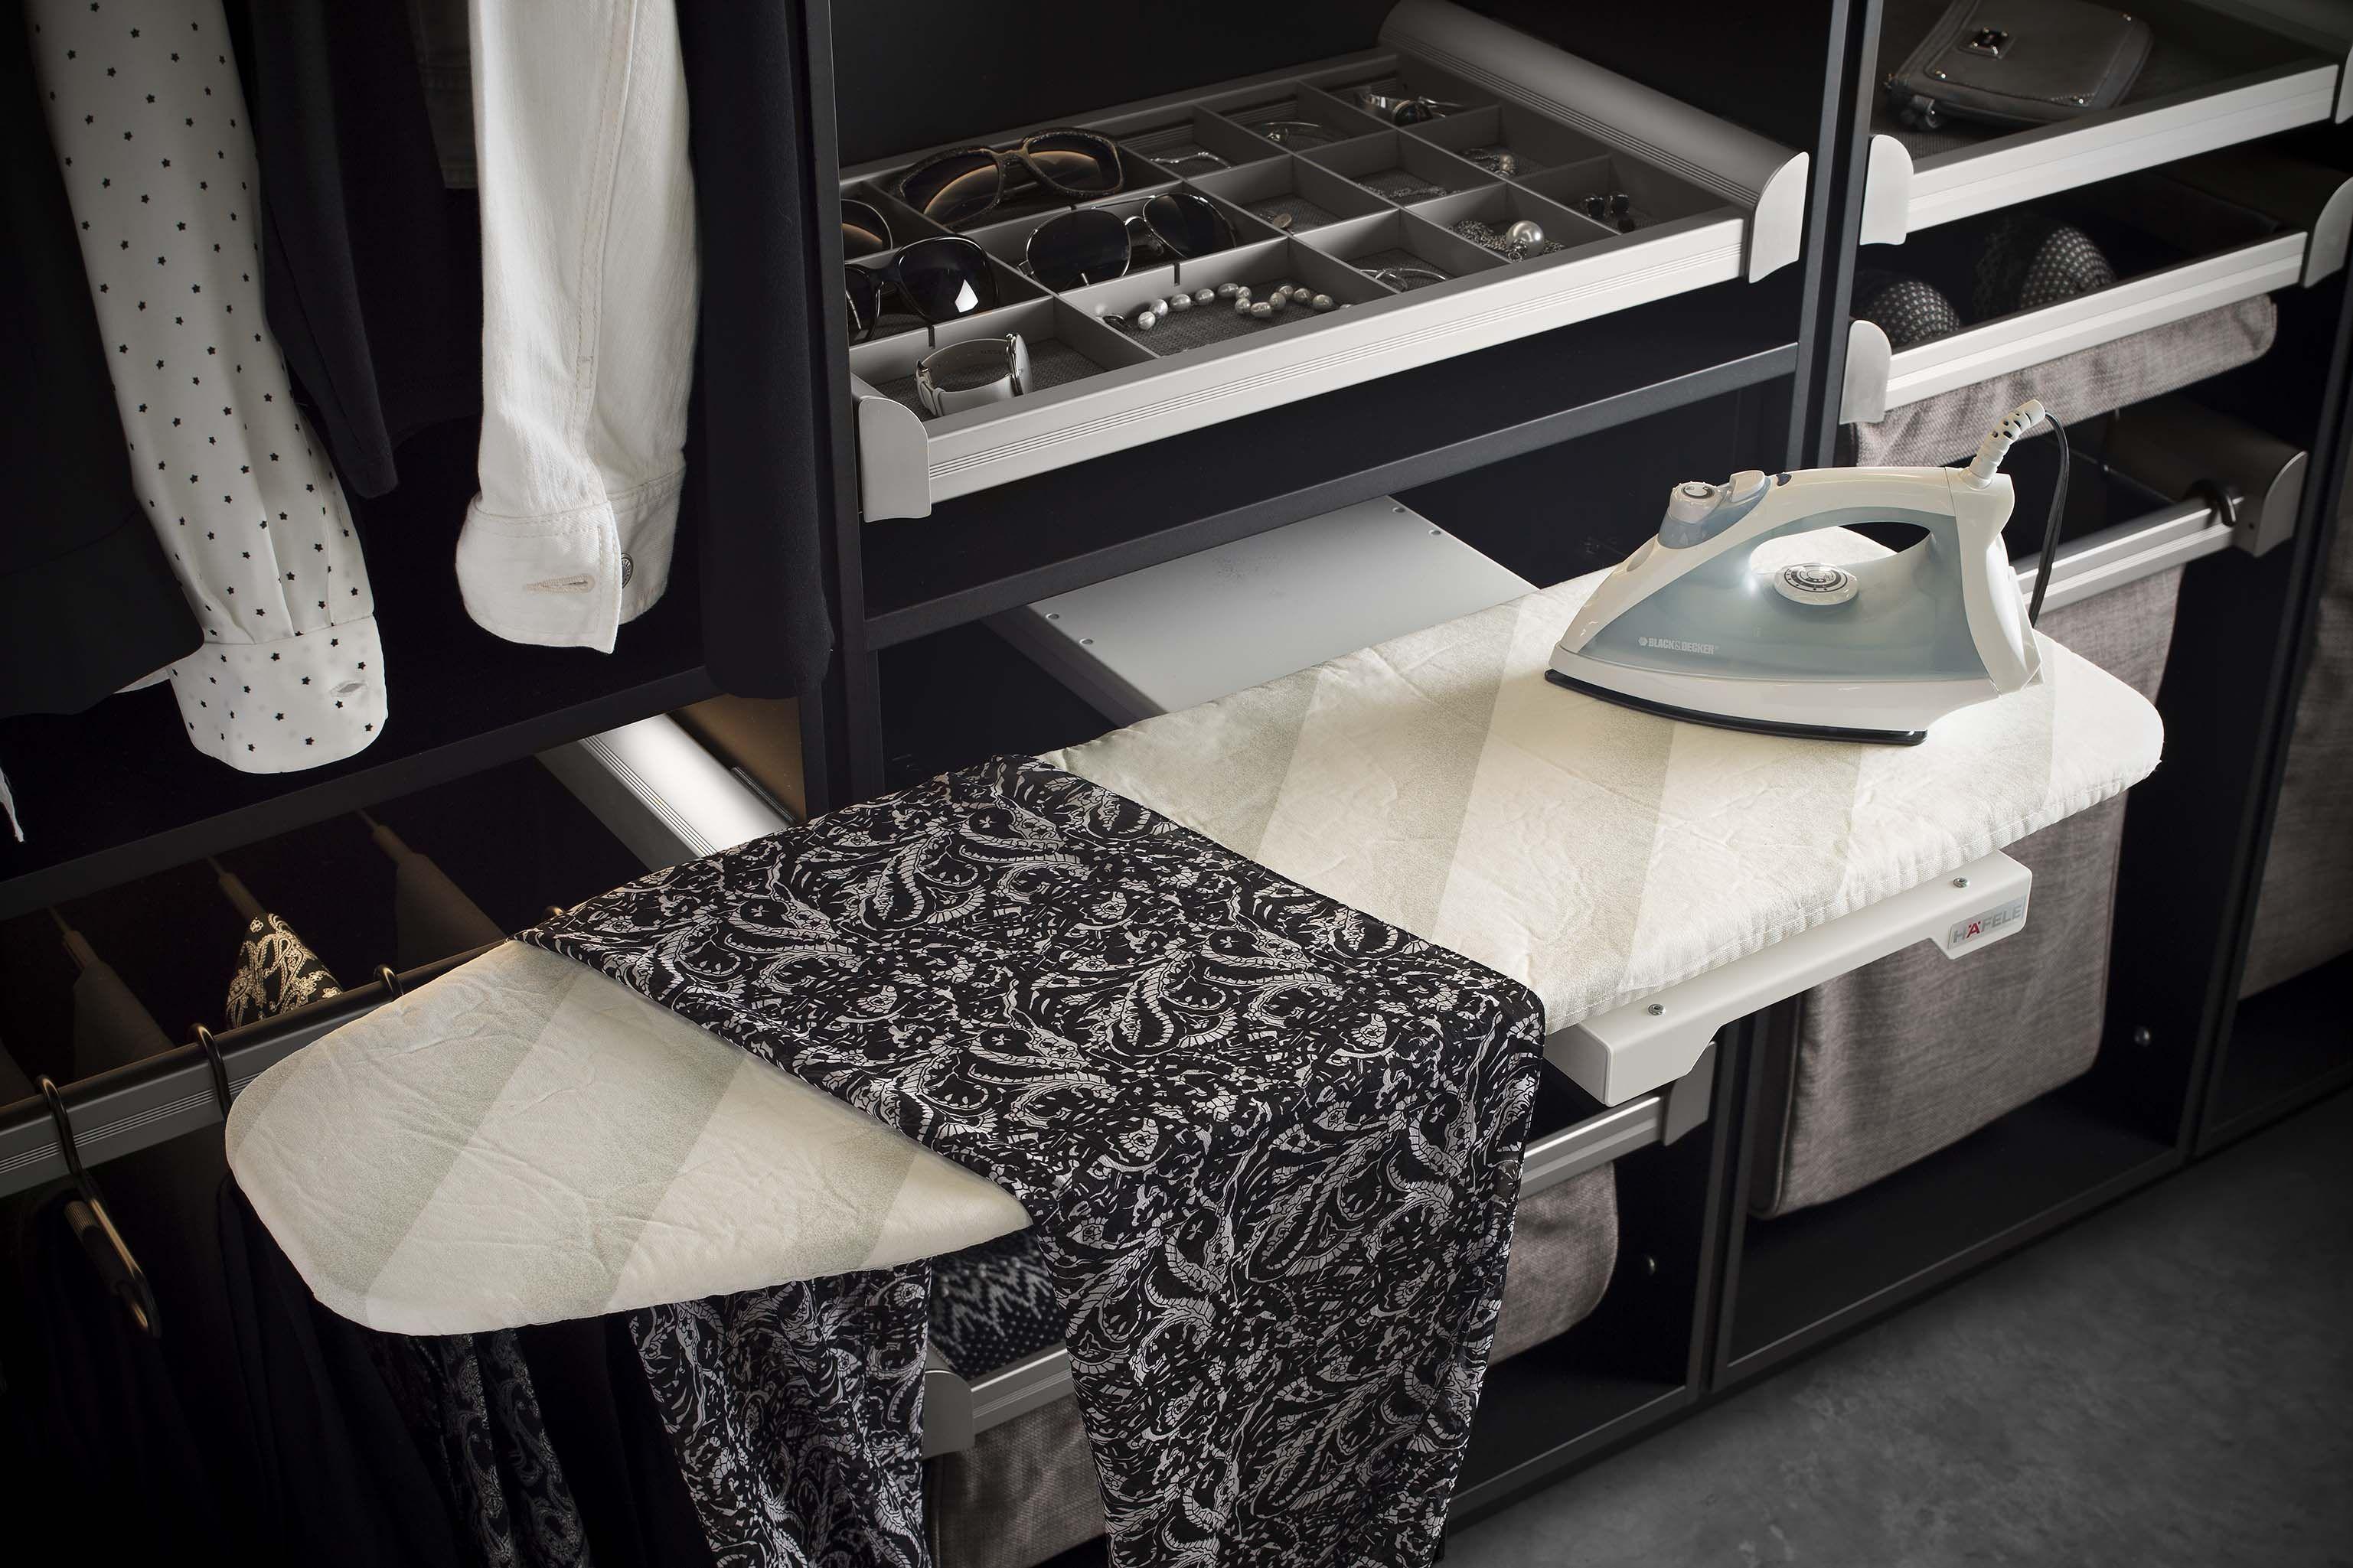 Hafele Ironfix Pull Out Ironing Board · Closet AccessoriesCloset  StorageCloset ...